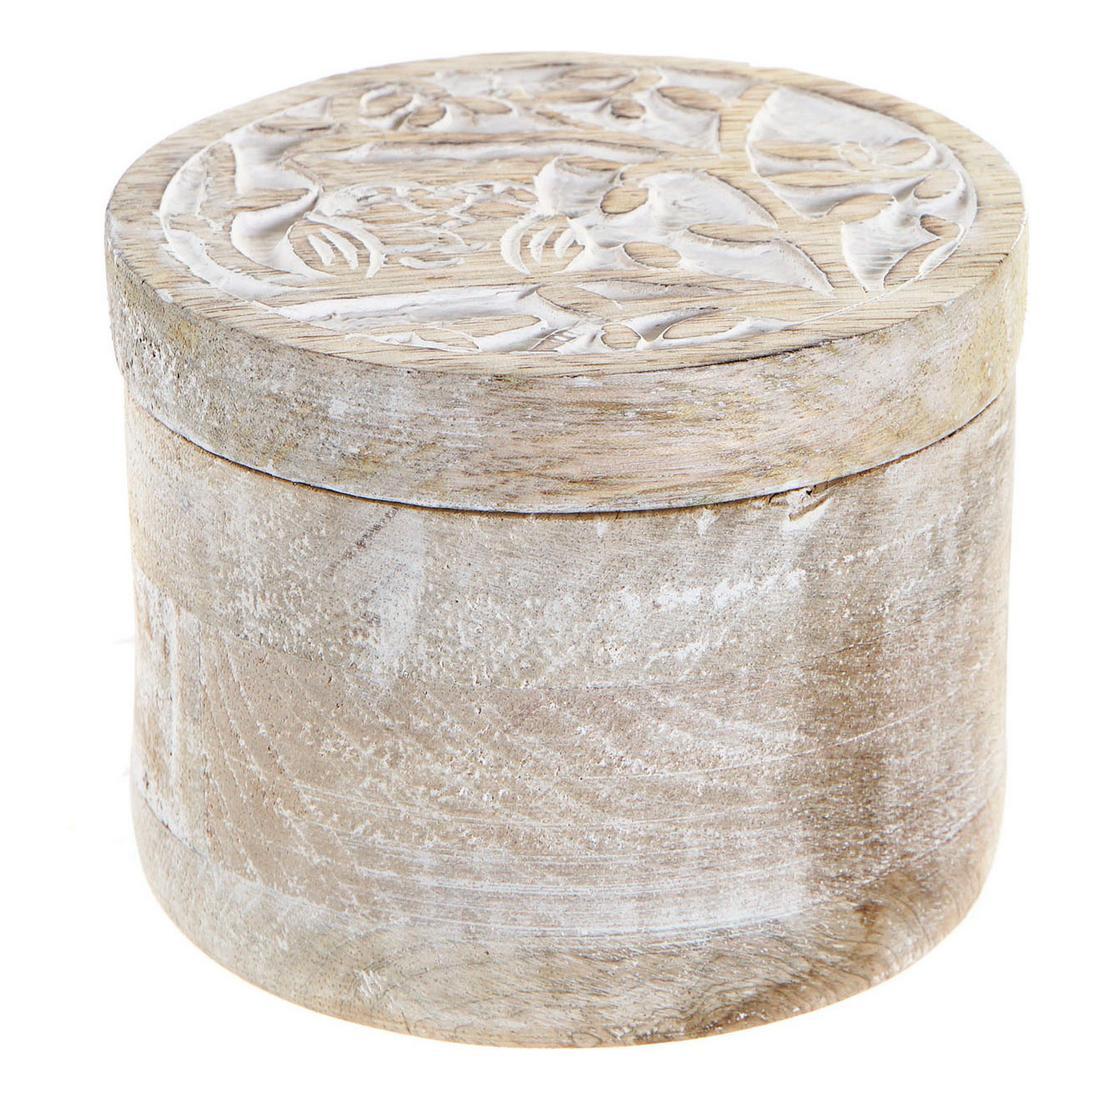 Jewelry box DKD Home Decor Indian Man Mango wood (10 x 10 x 8.5 cm)